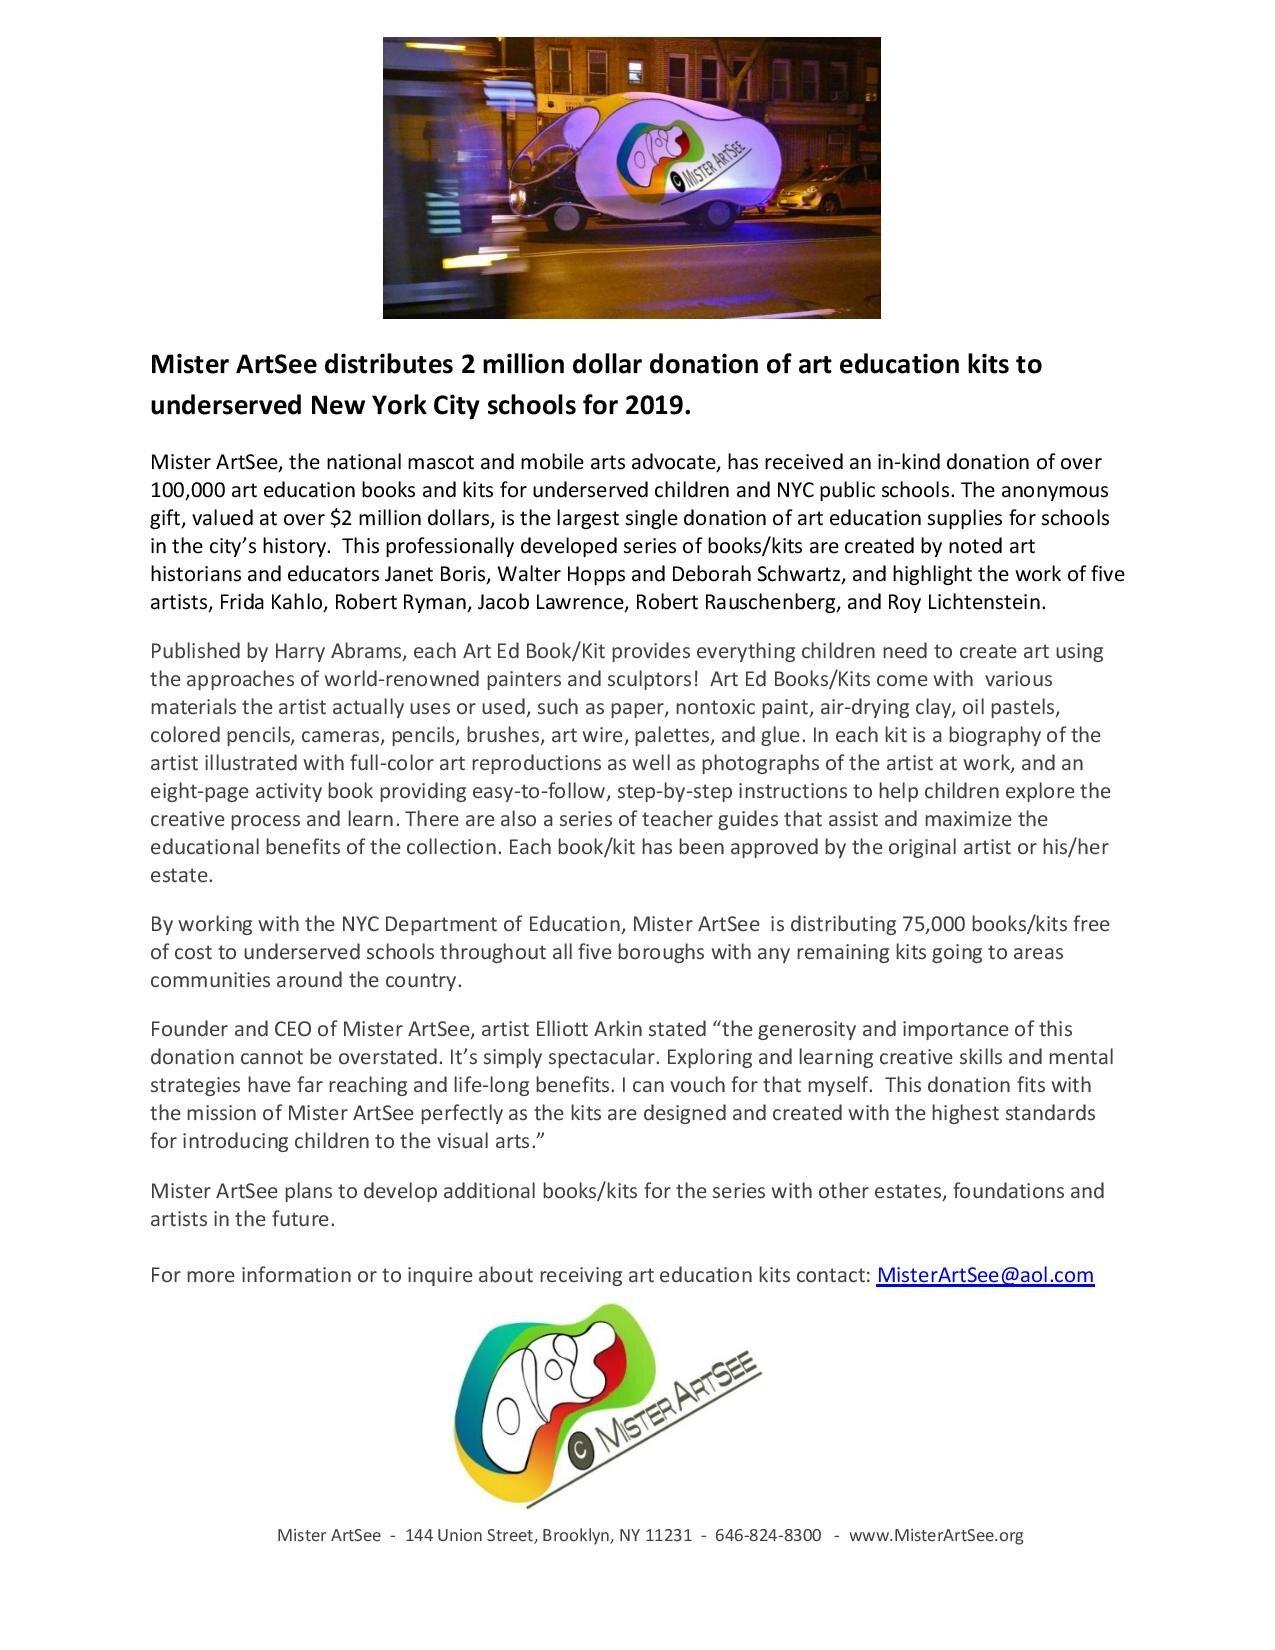 art ed books final release 9-21-19-page-001.jpg